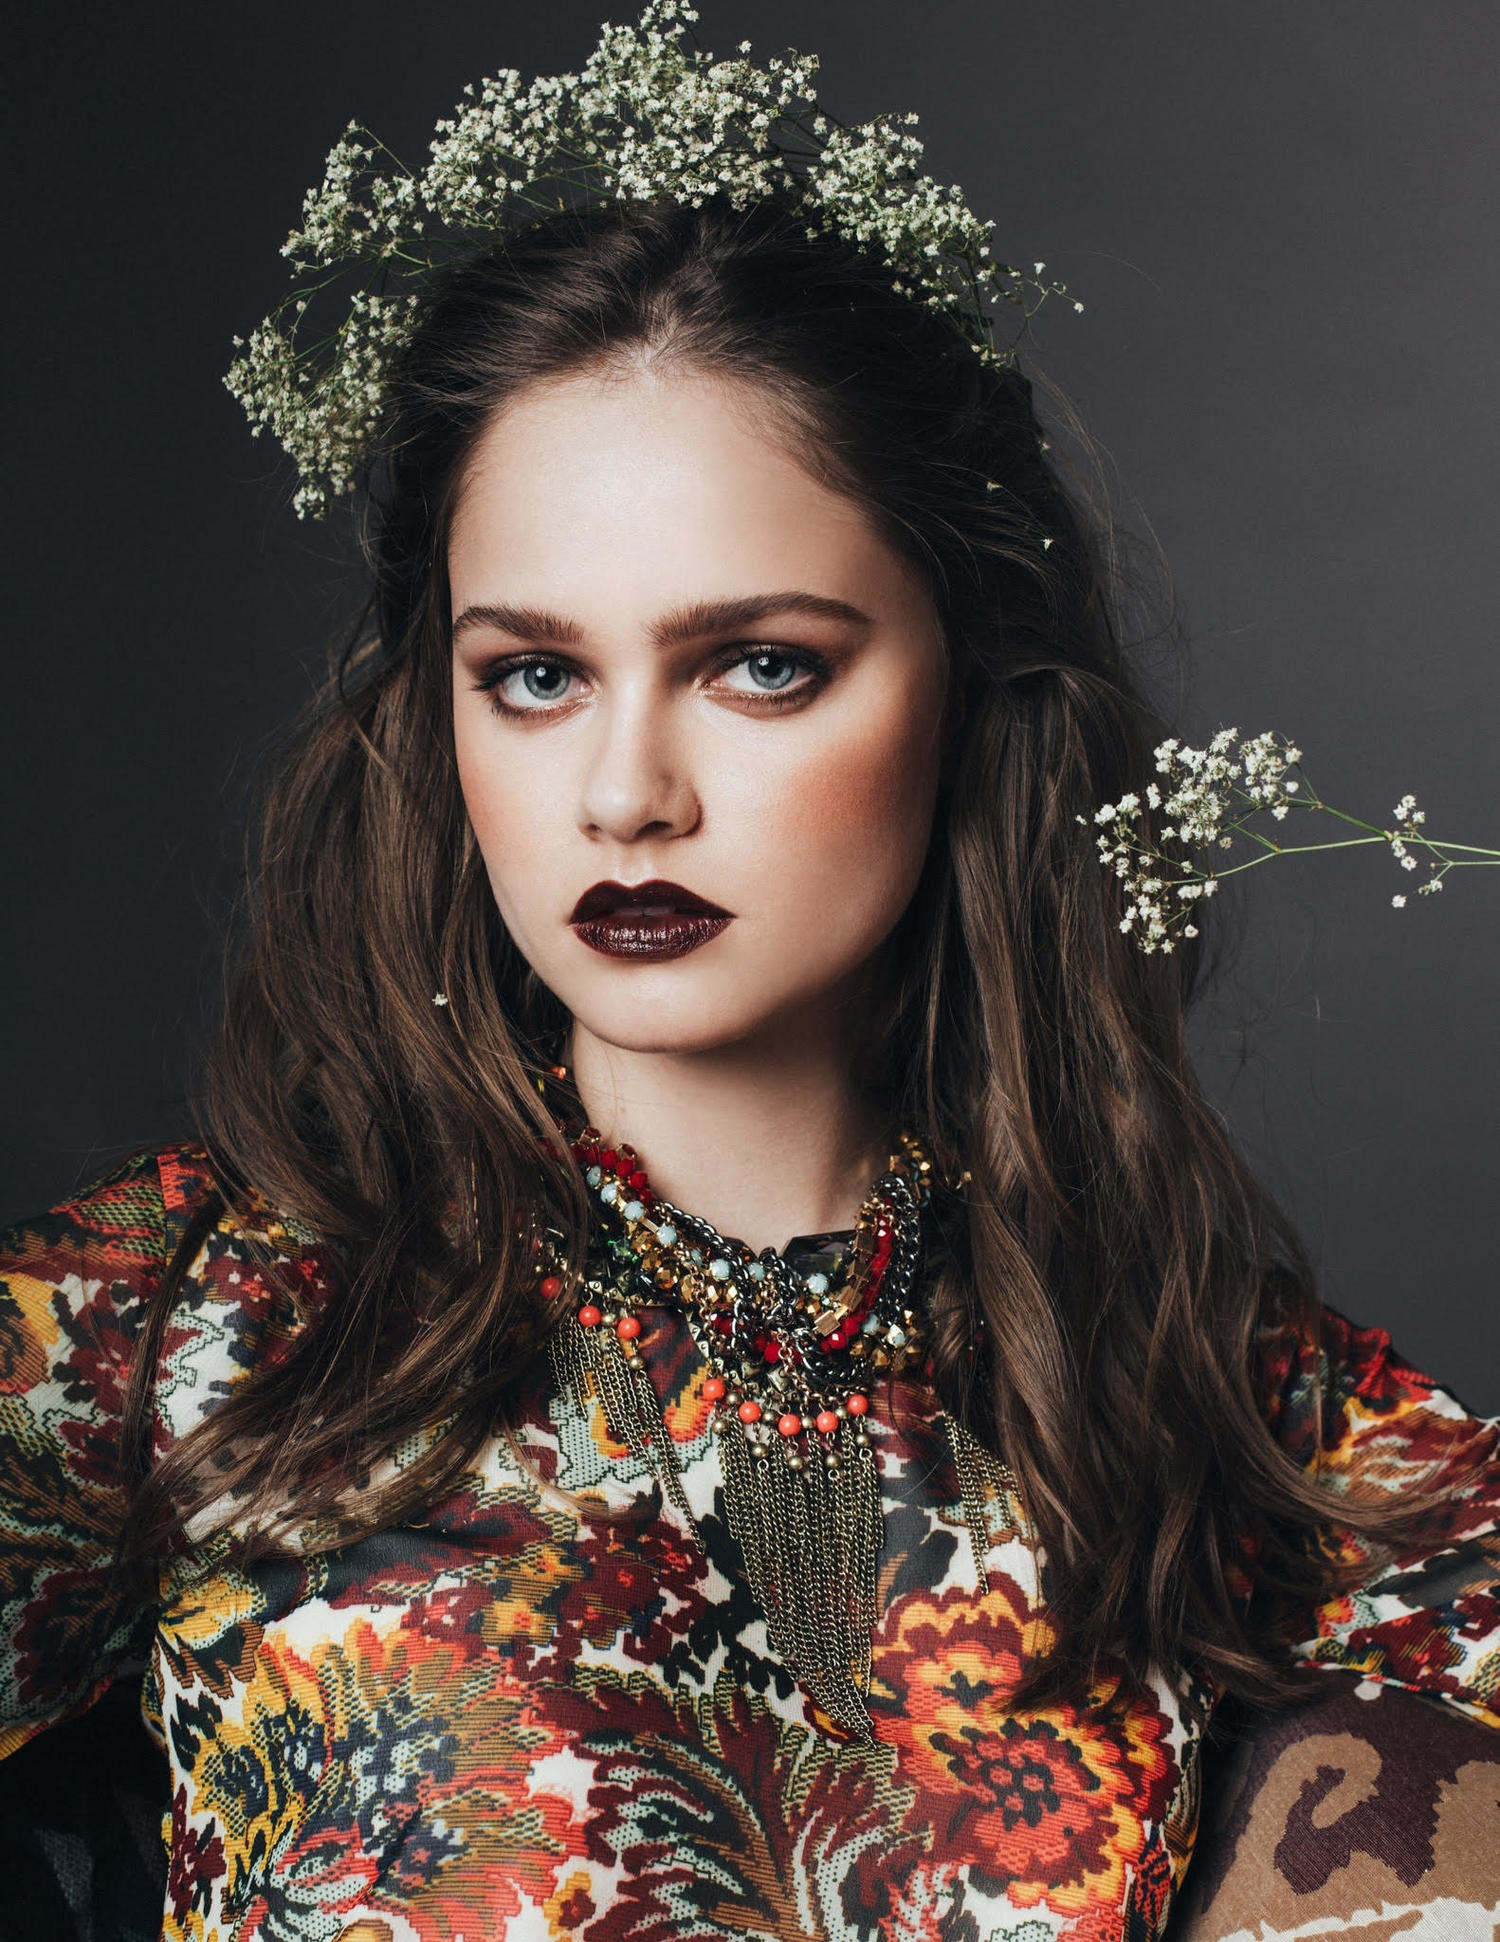 makeup-by-Mariana-Bull-02.jpg